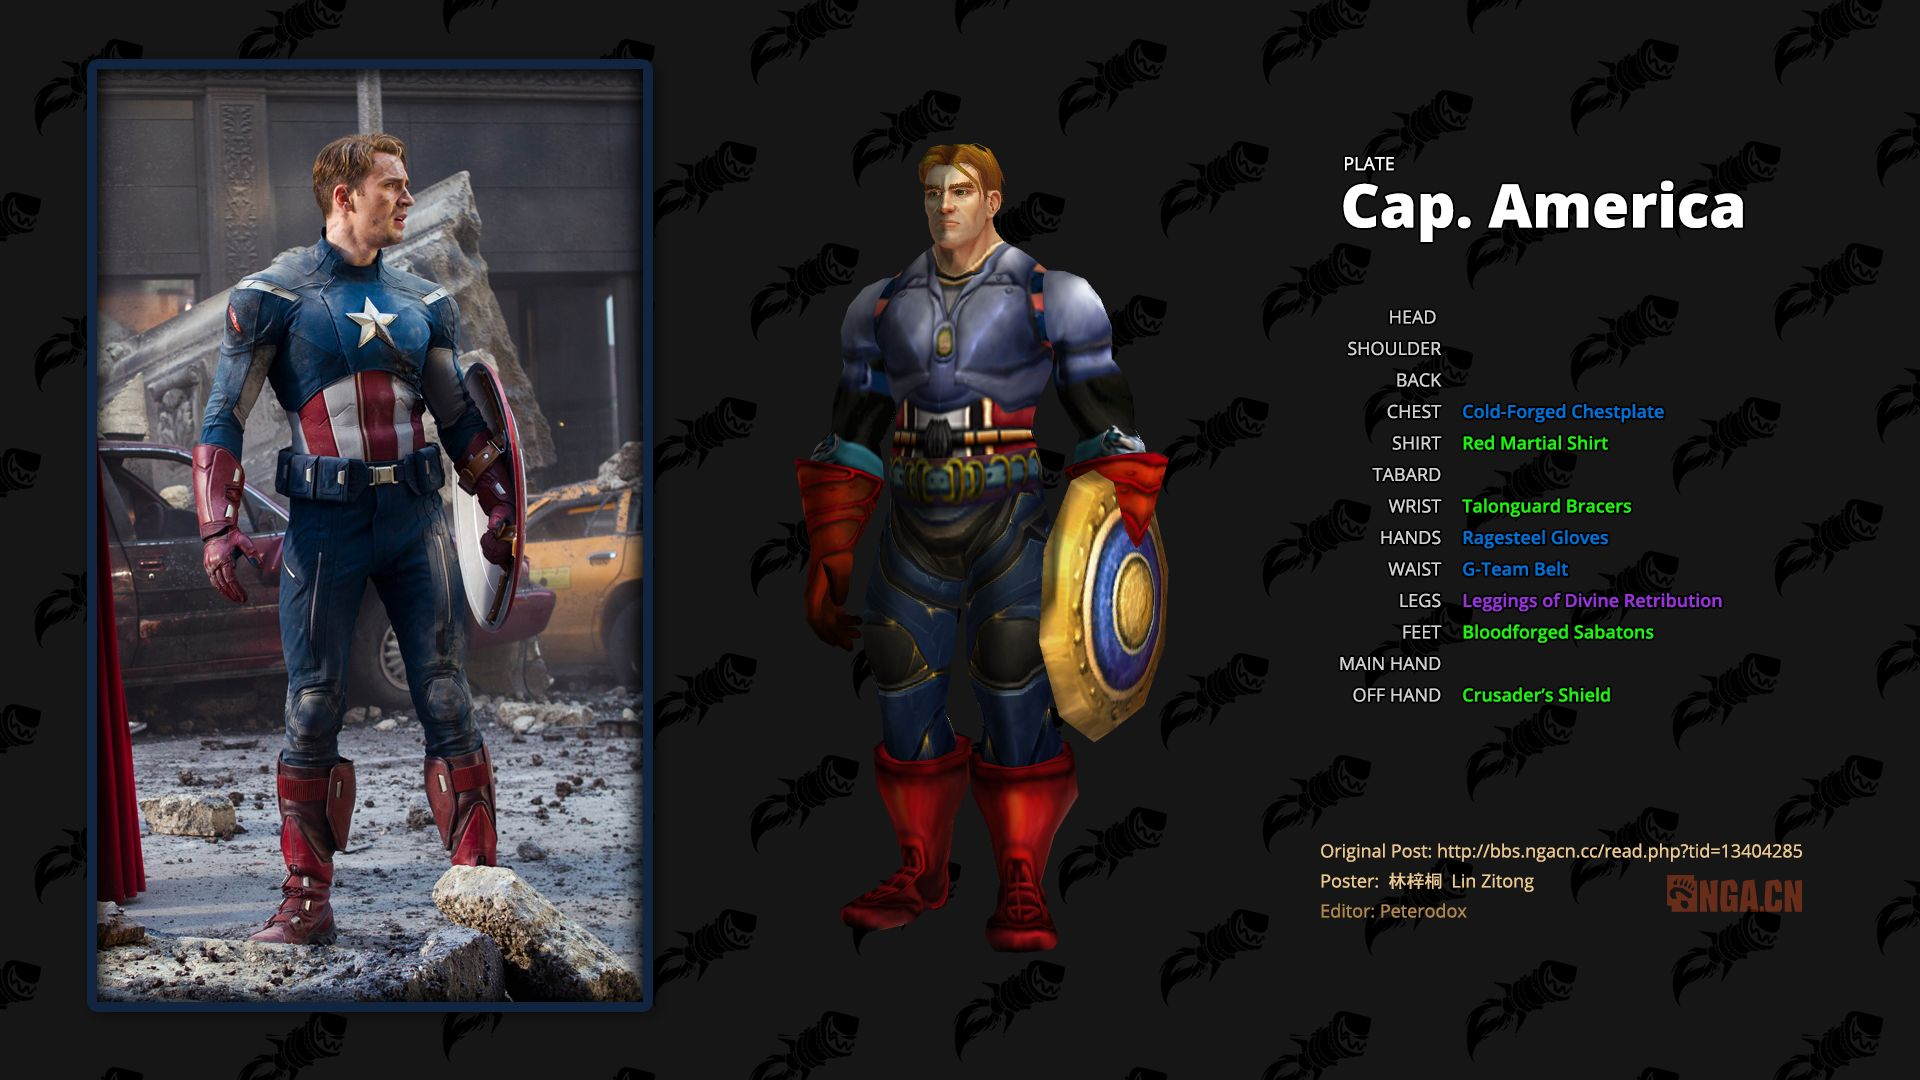 WoW Transmog Avengers Cap America